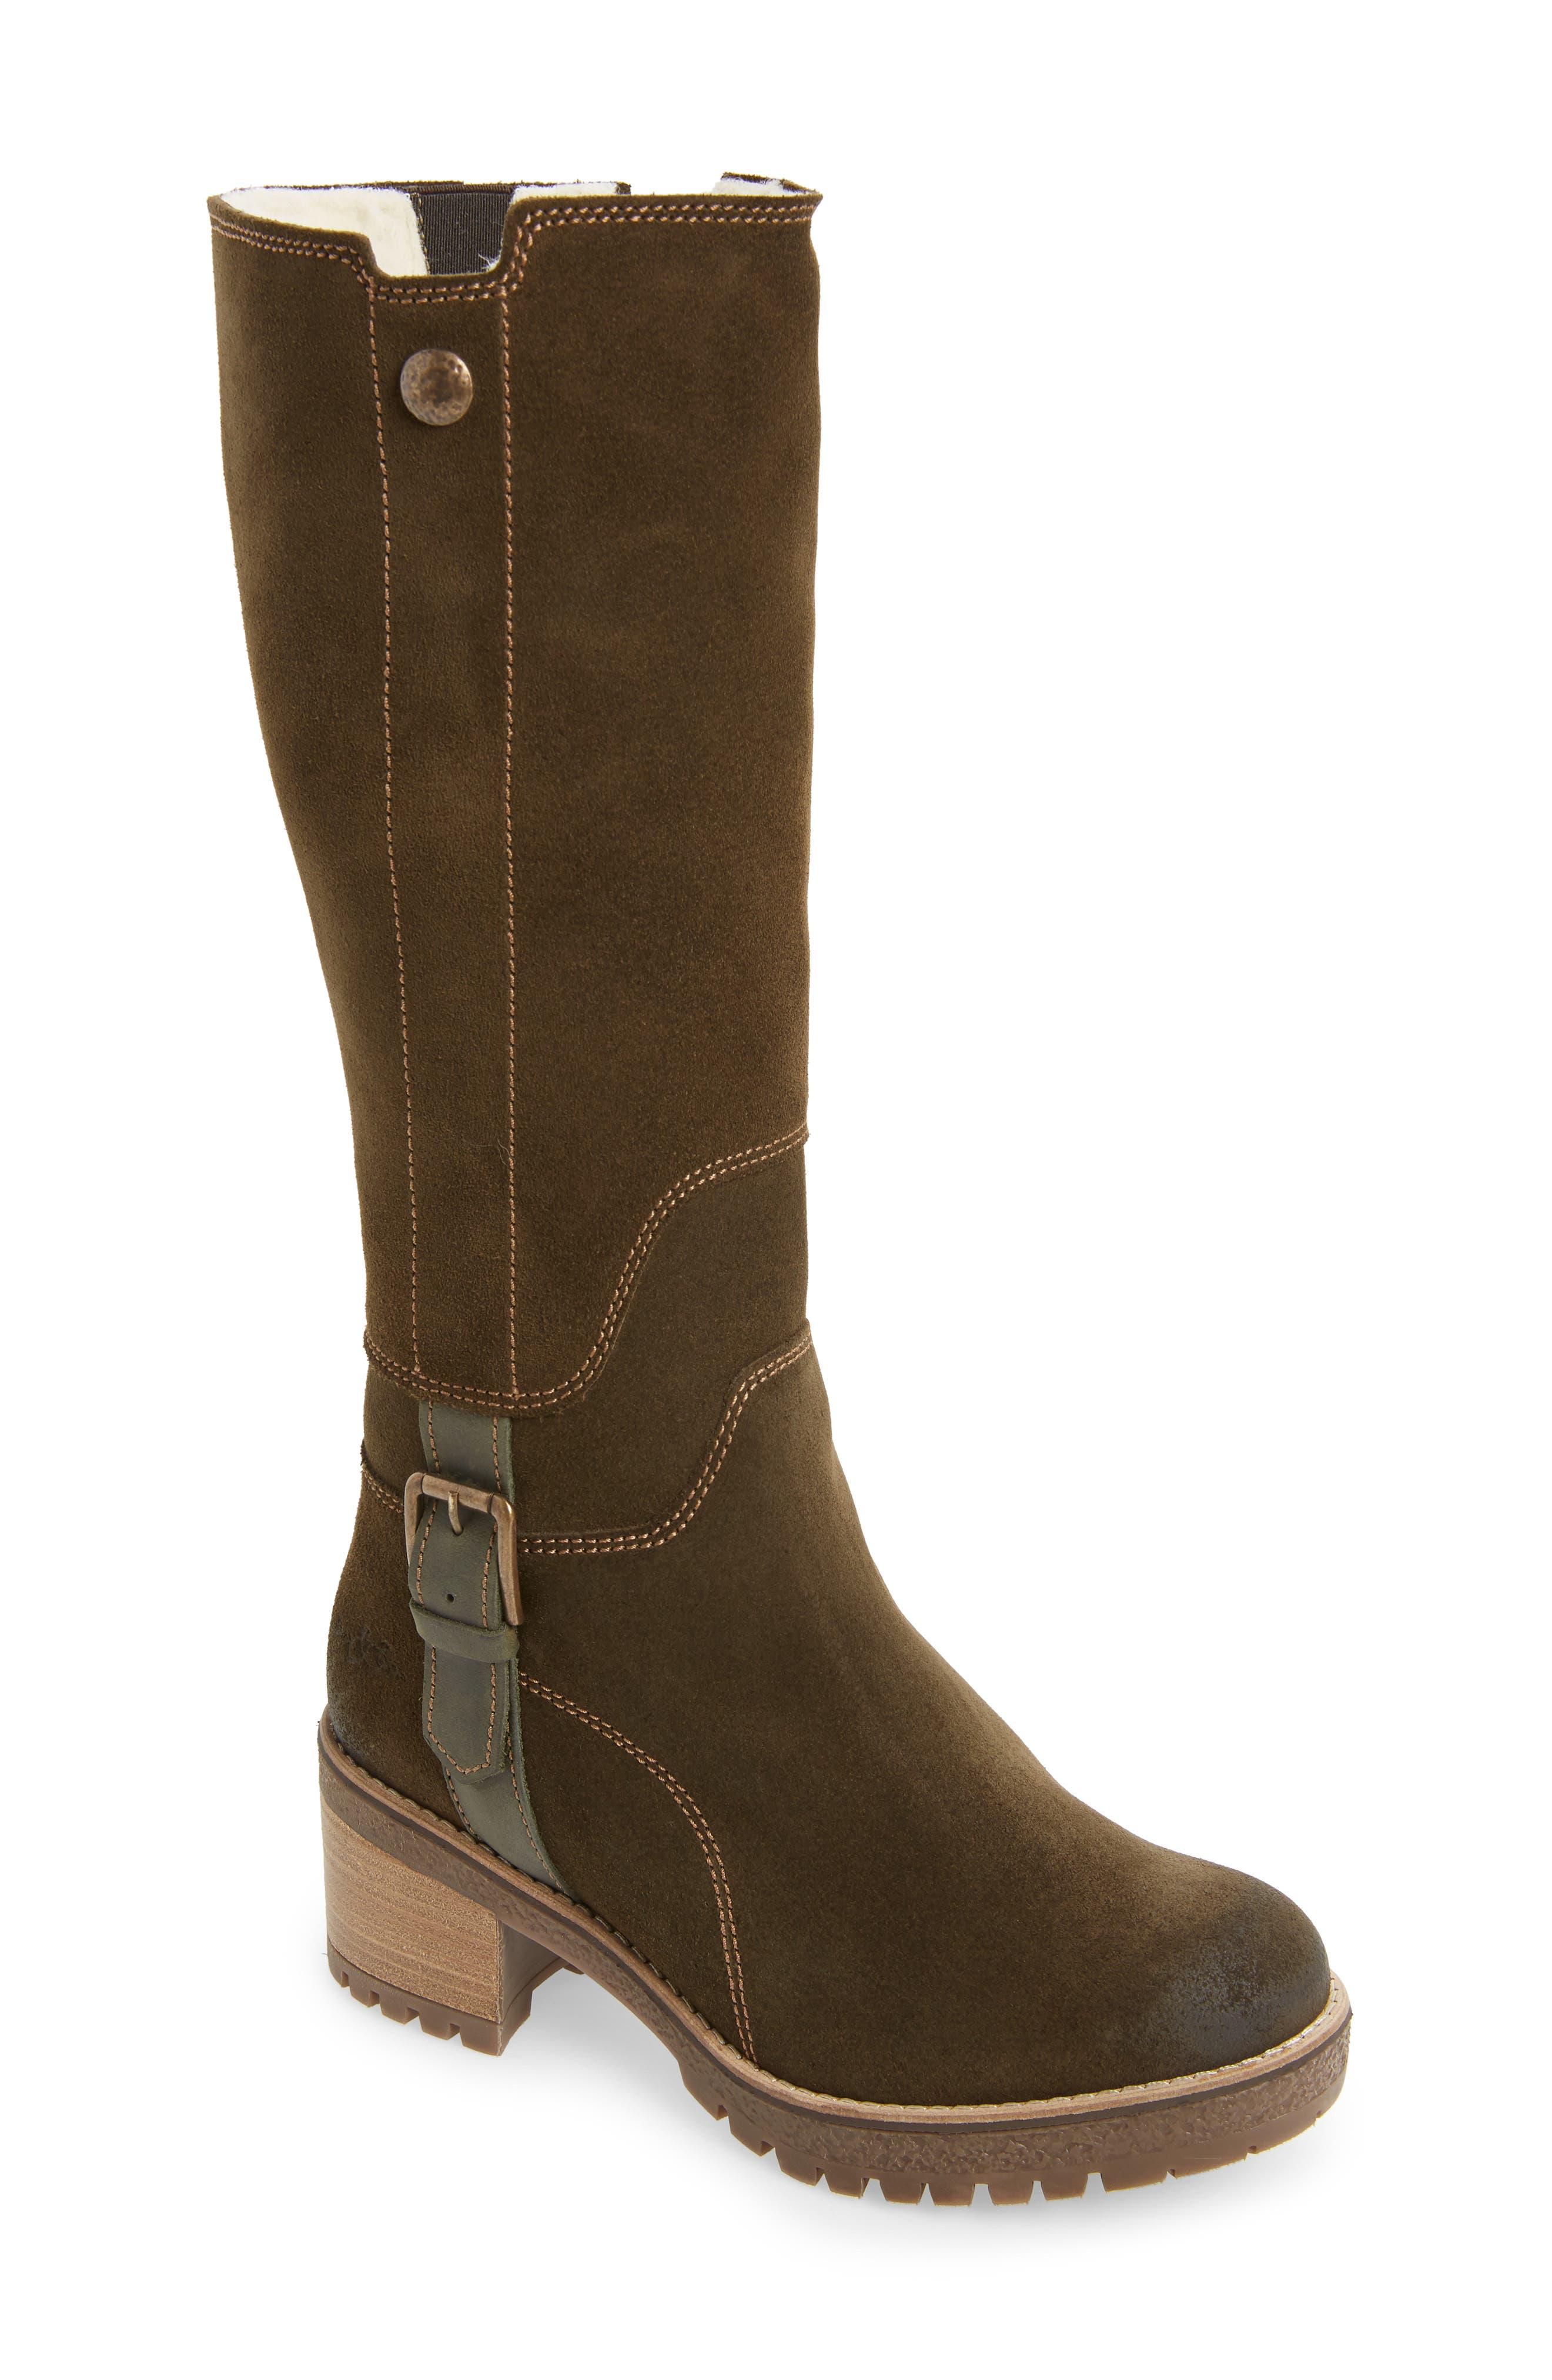 Bos. & Co. Major Waterproof Boot - Green